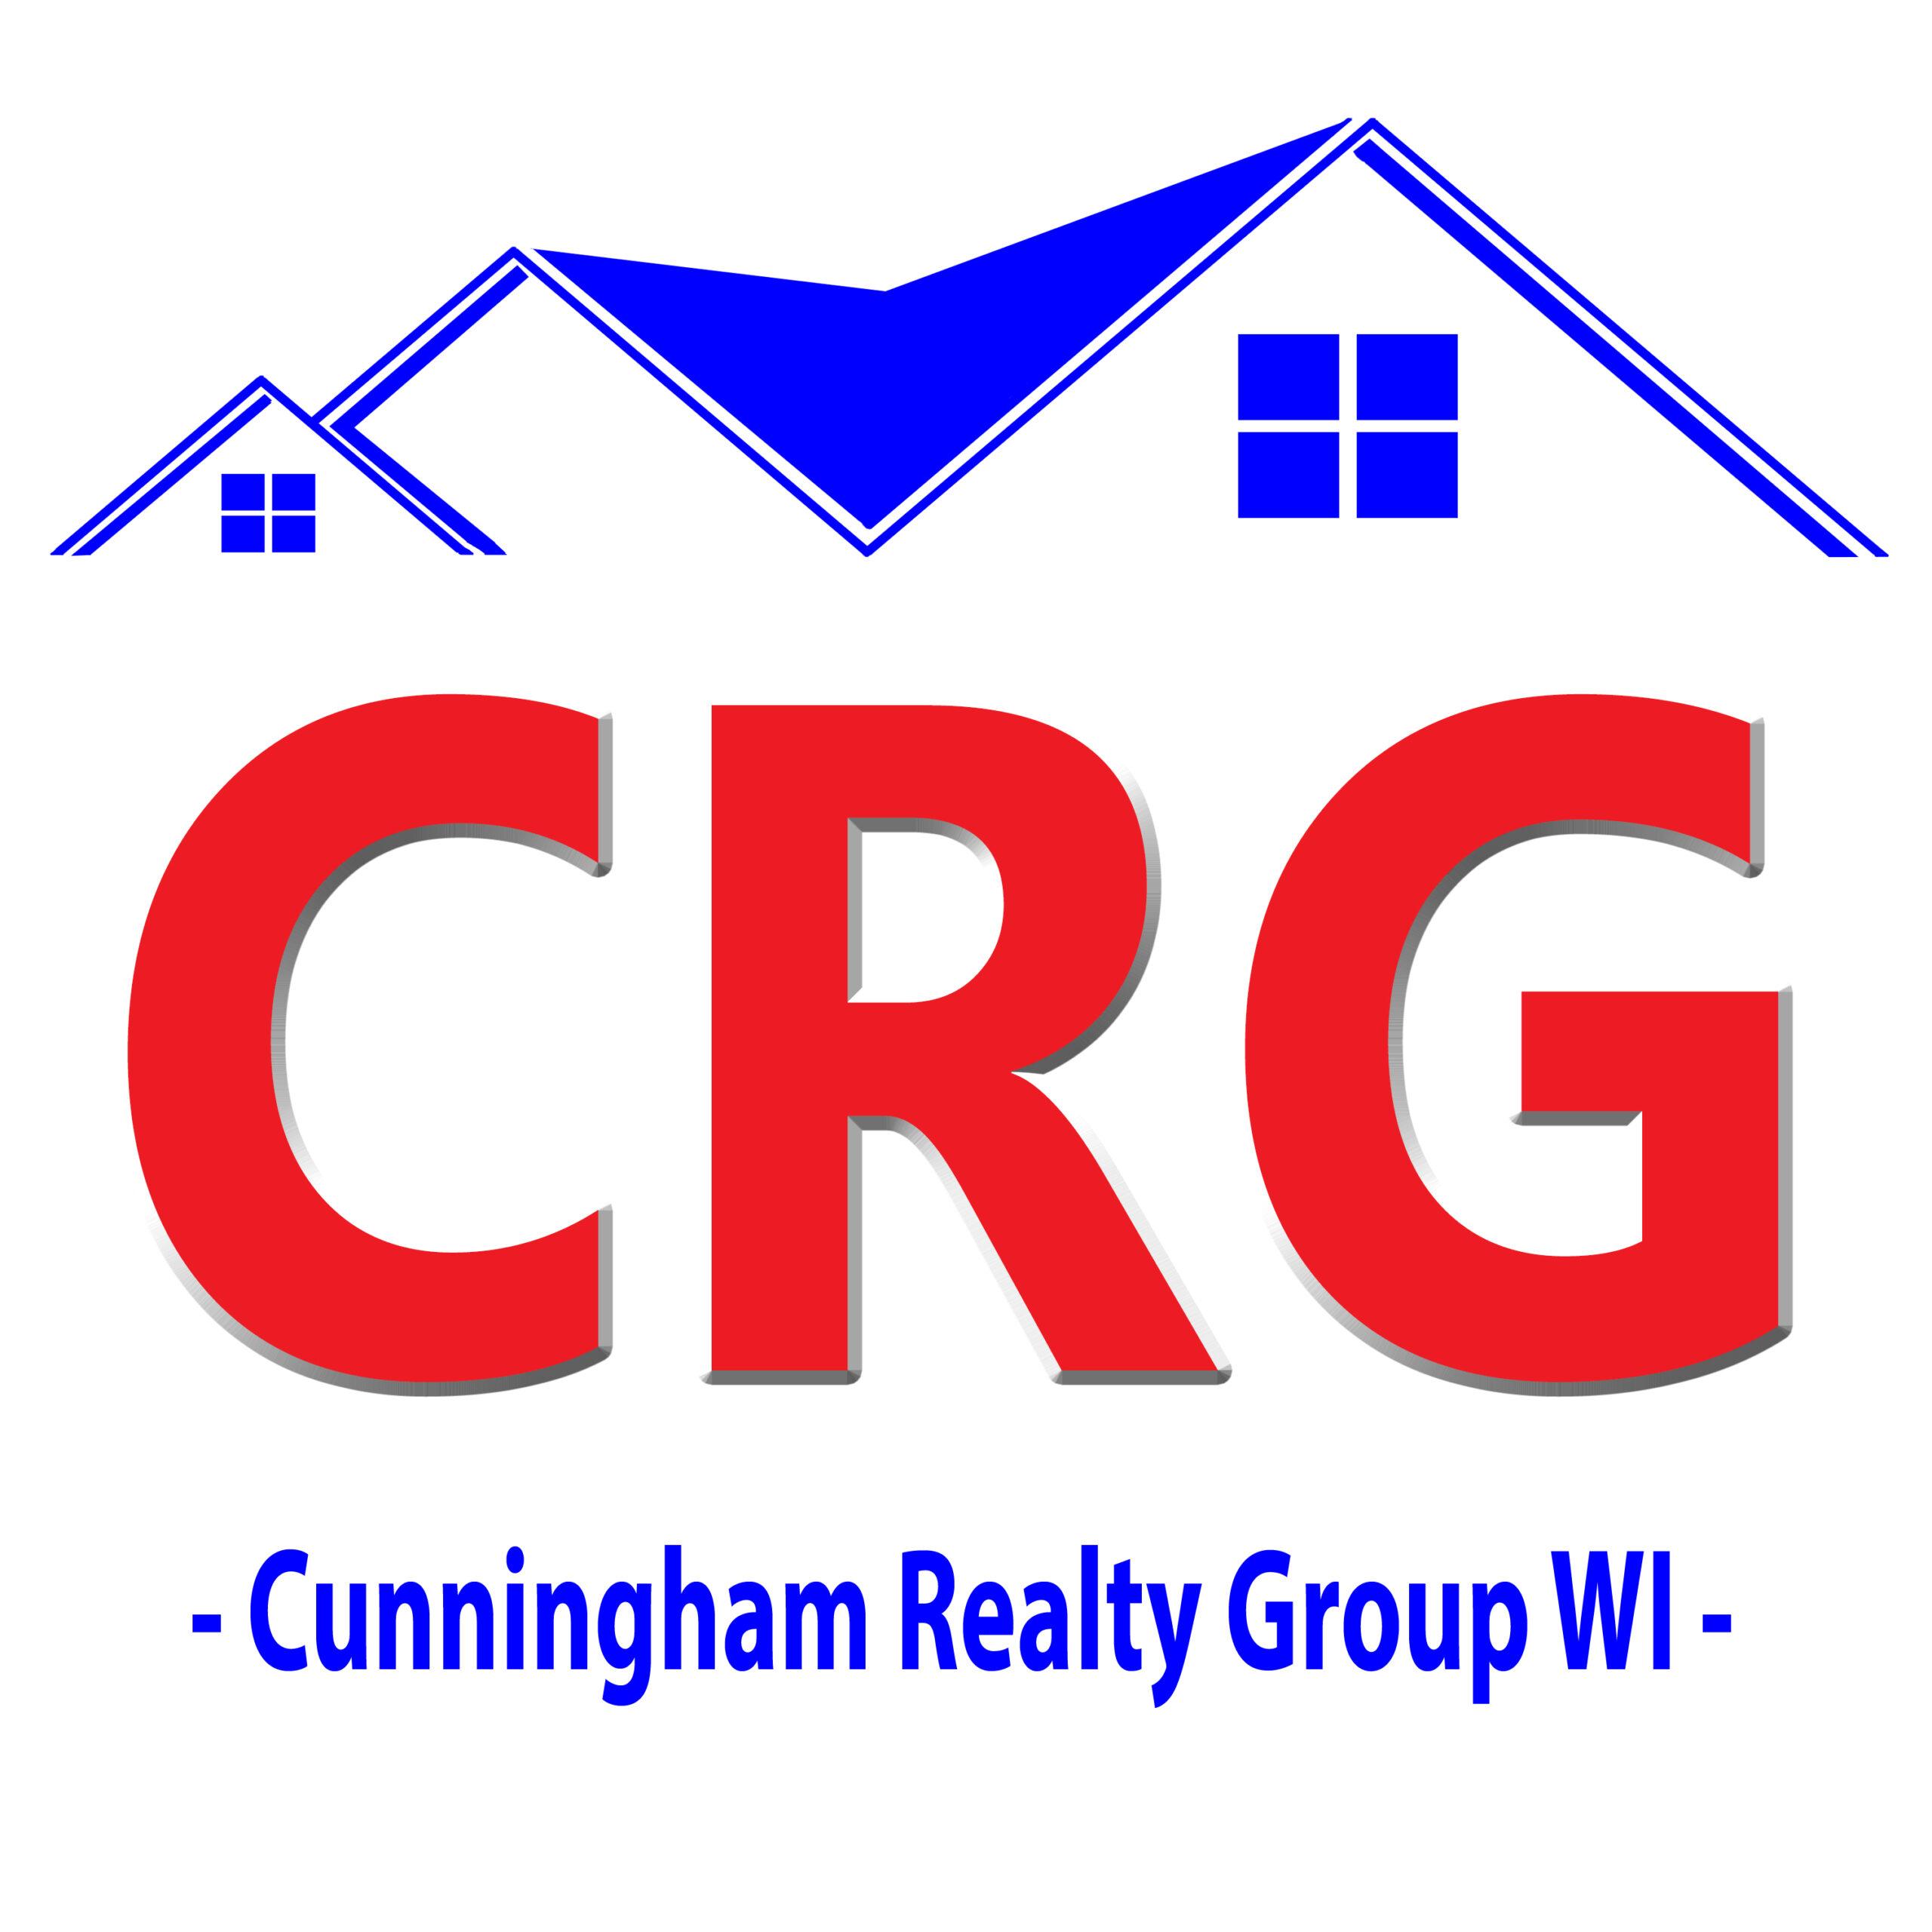 CRG Logo roofline